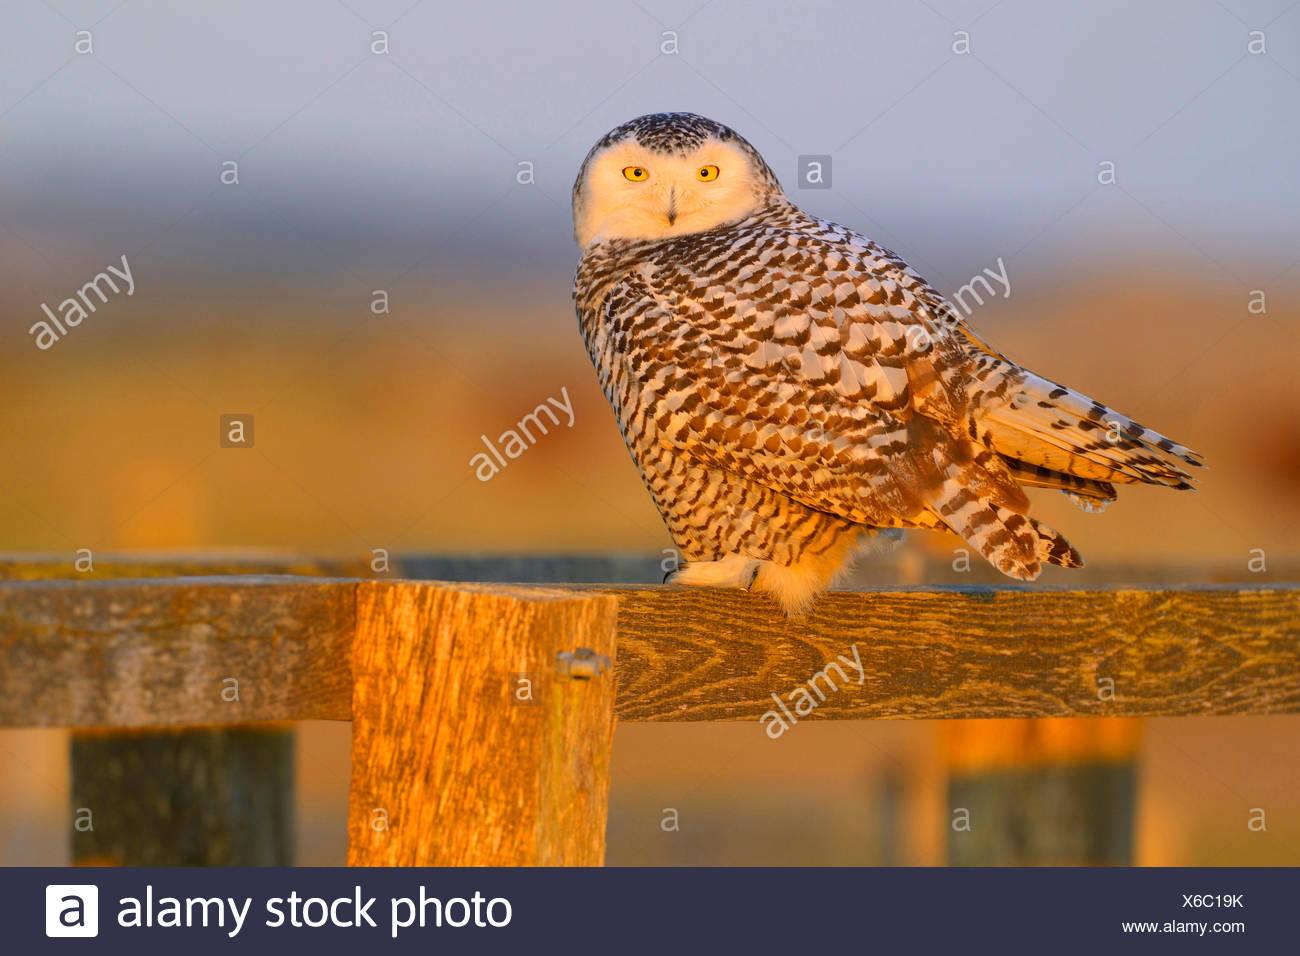 Snowy Owl (Strix scandiaca, Nyctea scandiaca, Bubo scandiacus), female resting on a wooden fence in evening light, Netherlands - Stock Image